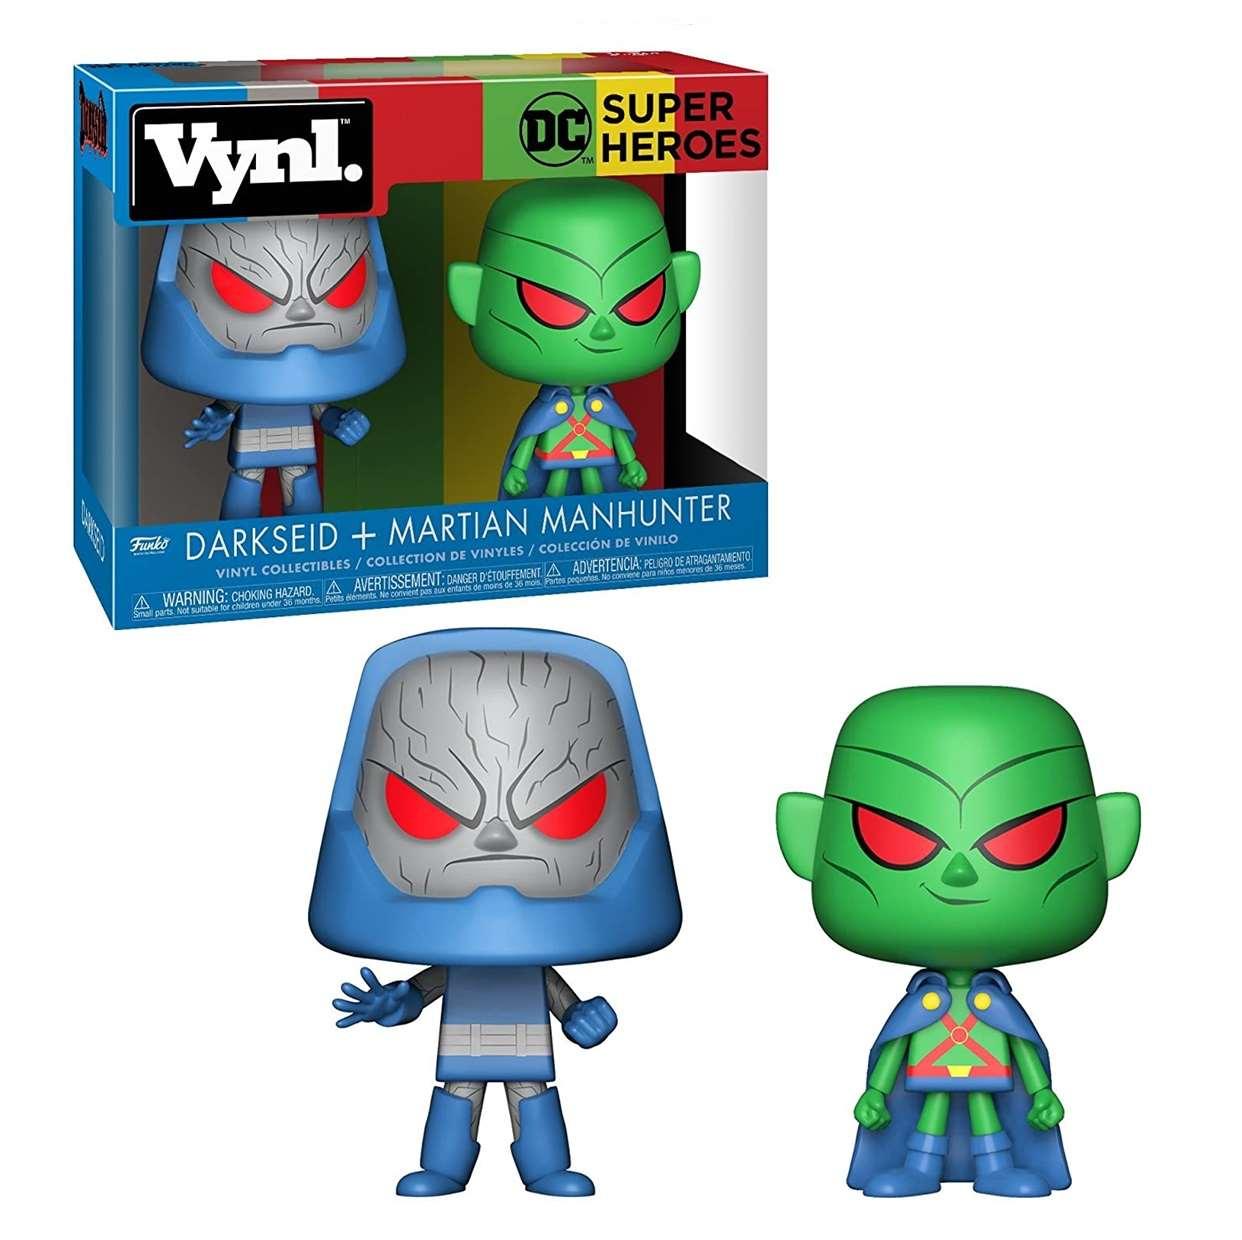 Darksaid + Martian Manhunter Dc Super Heroes Funko Vynl